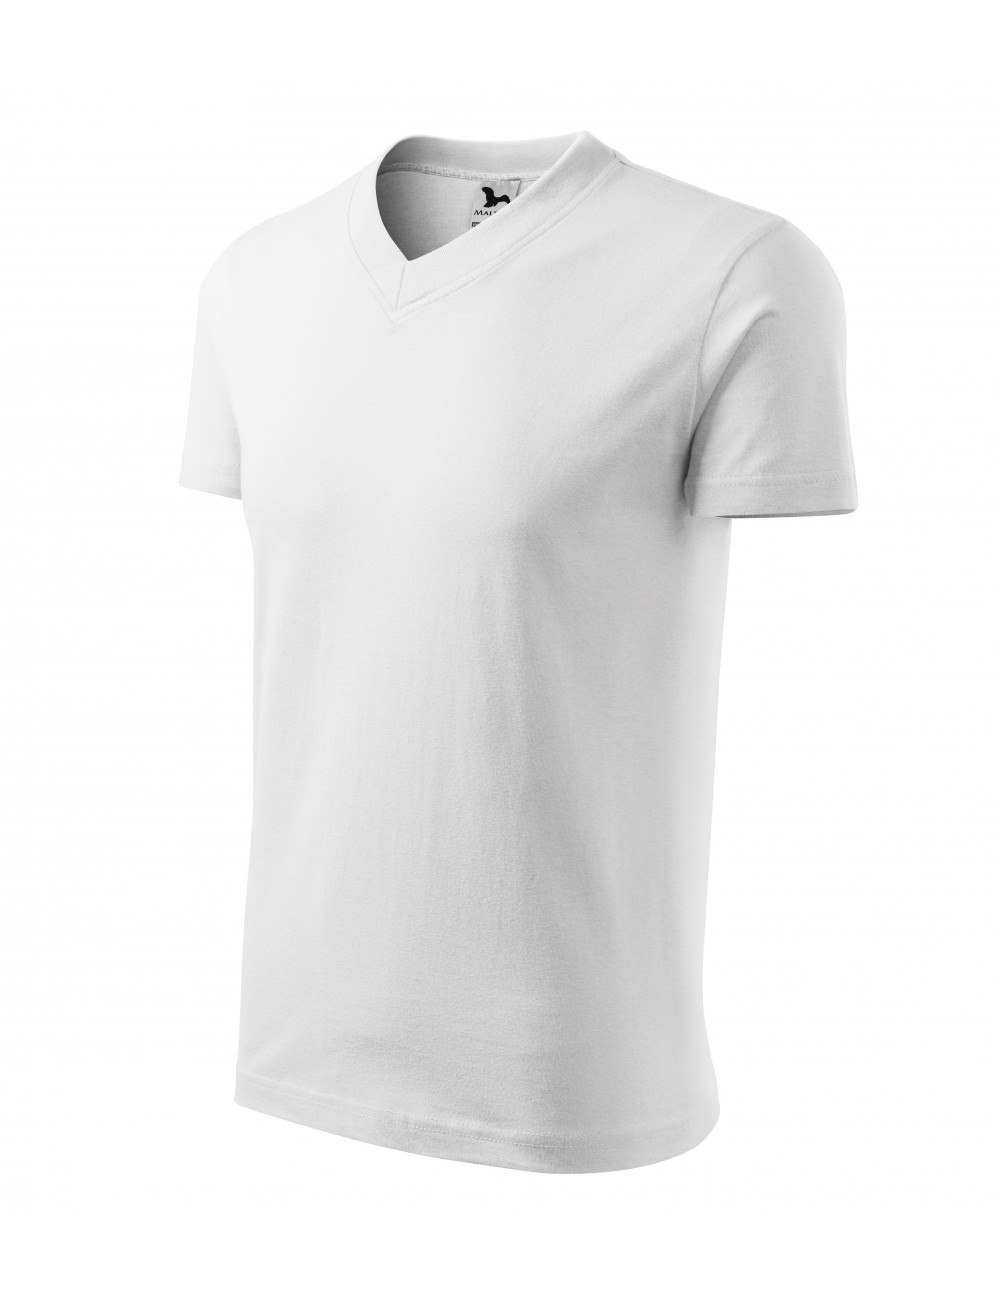 Adler MALFINI Koszulka unisex V-neck 102 biały